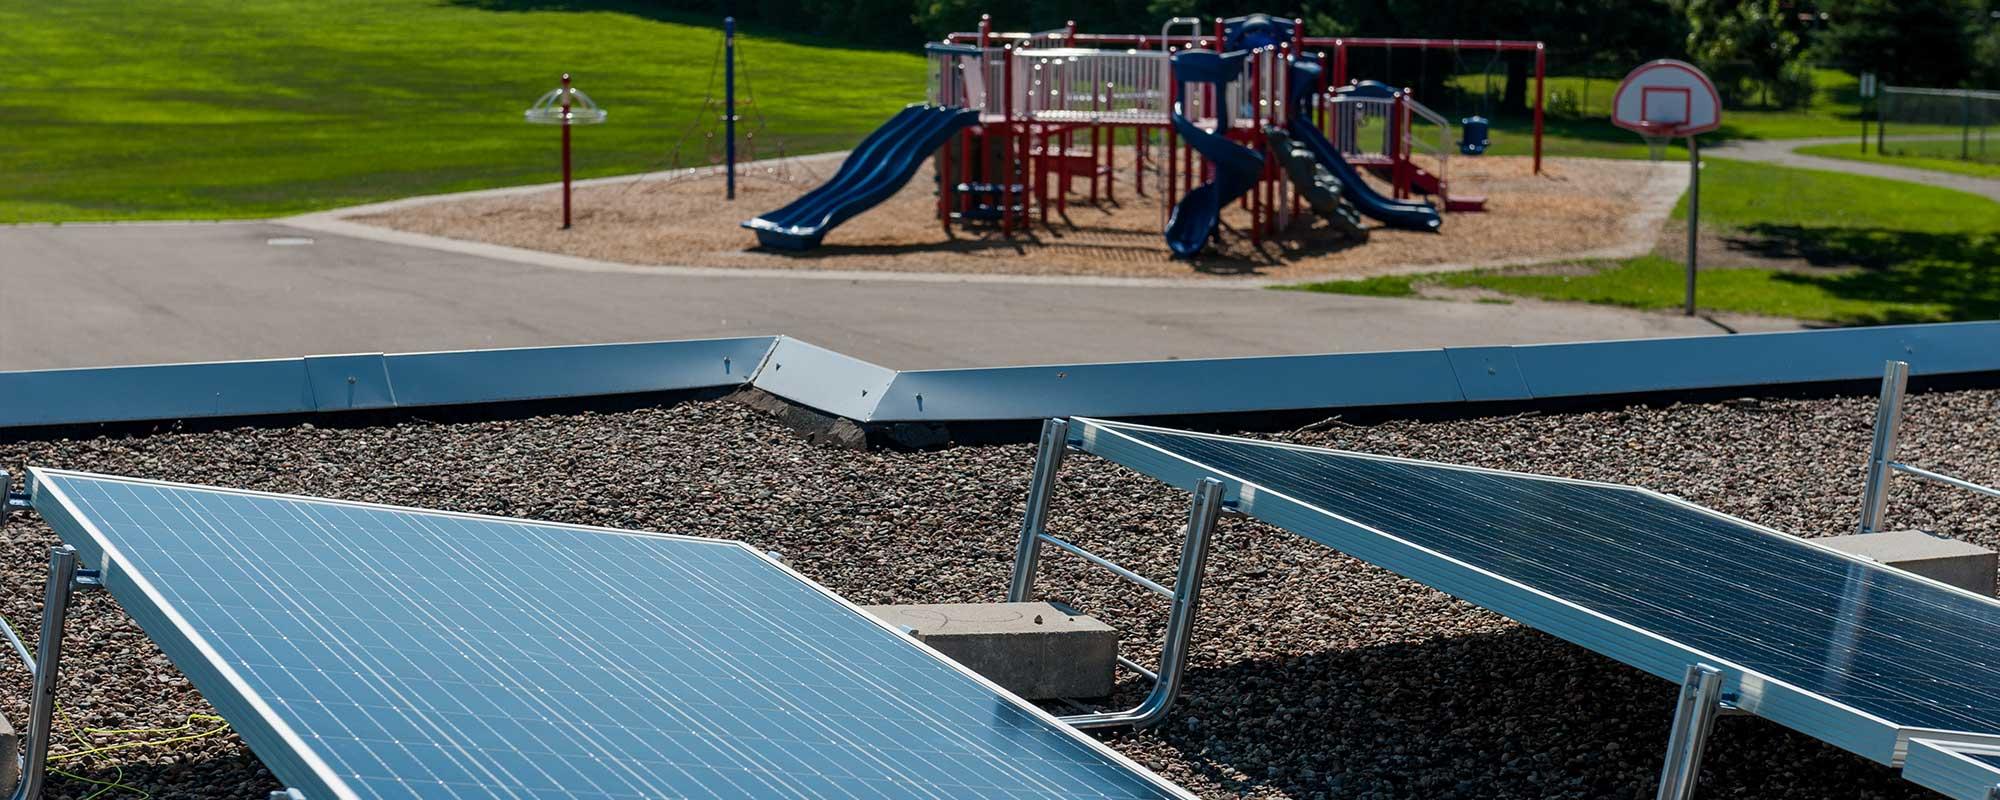 Snail Lake Kindergarden School Solar Array